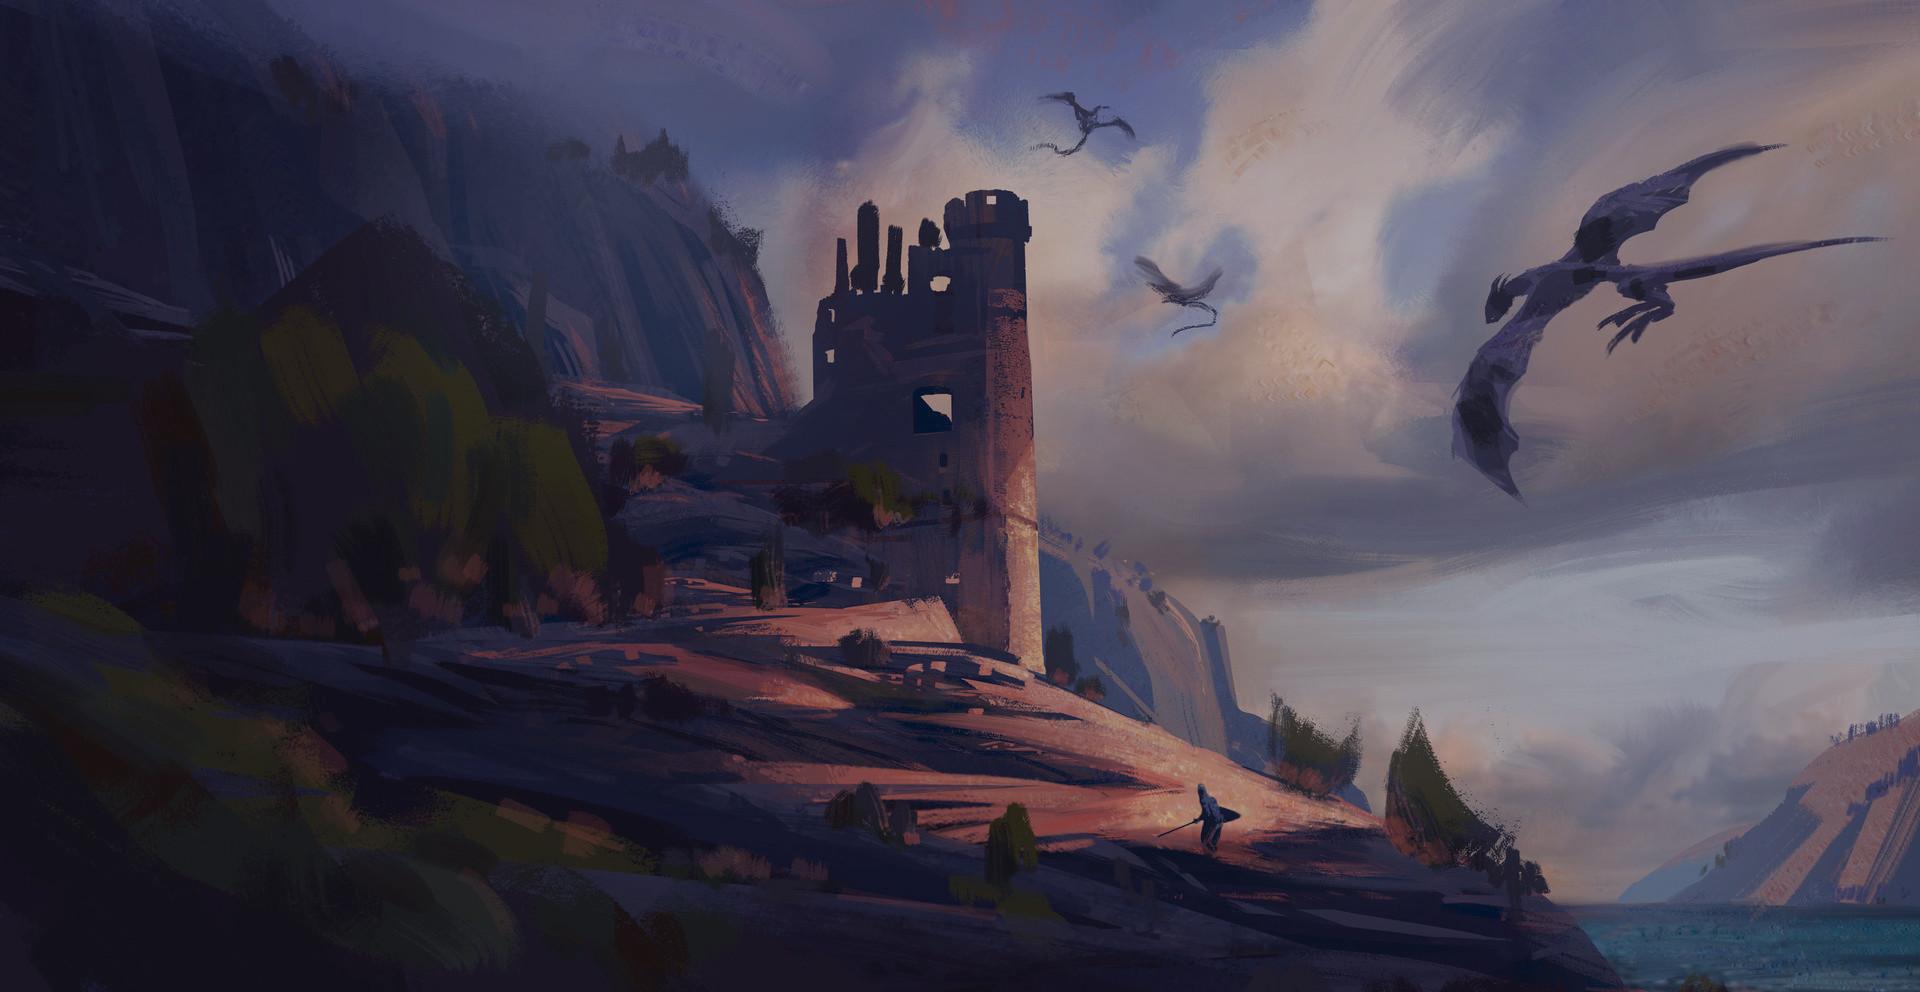 Pace porter zasada castle7